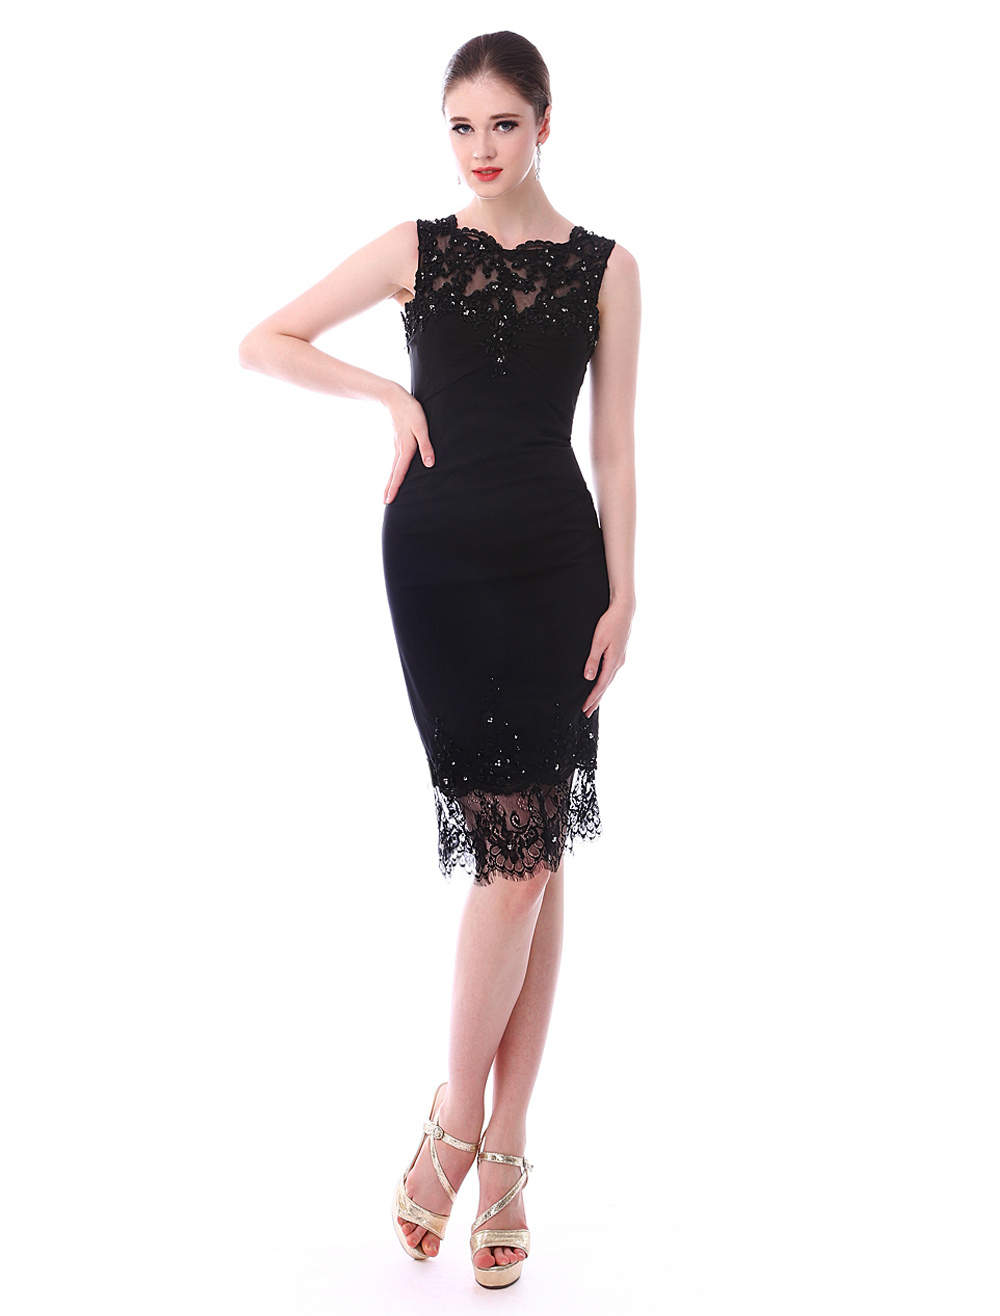 Black Knee-Length Satin Lace Cocktail Dress Wedding Guest Dress (Cocktail Dresses) photo